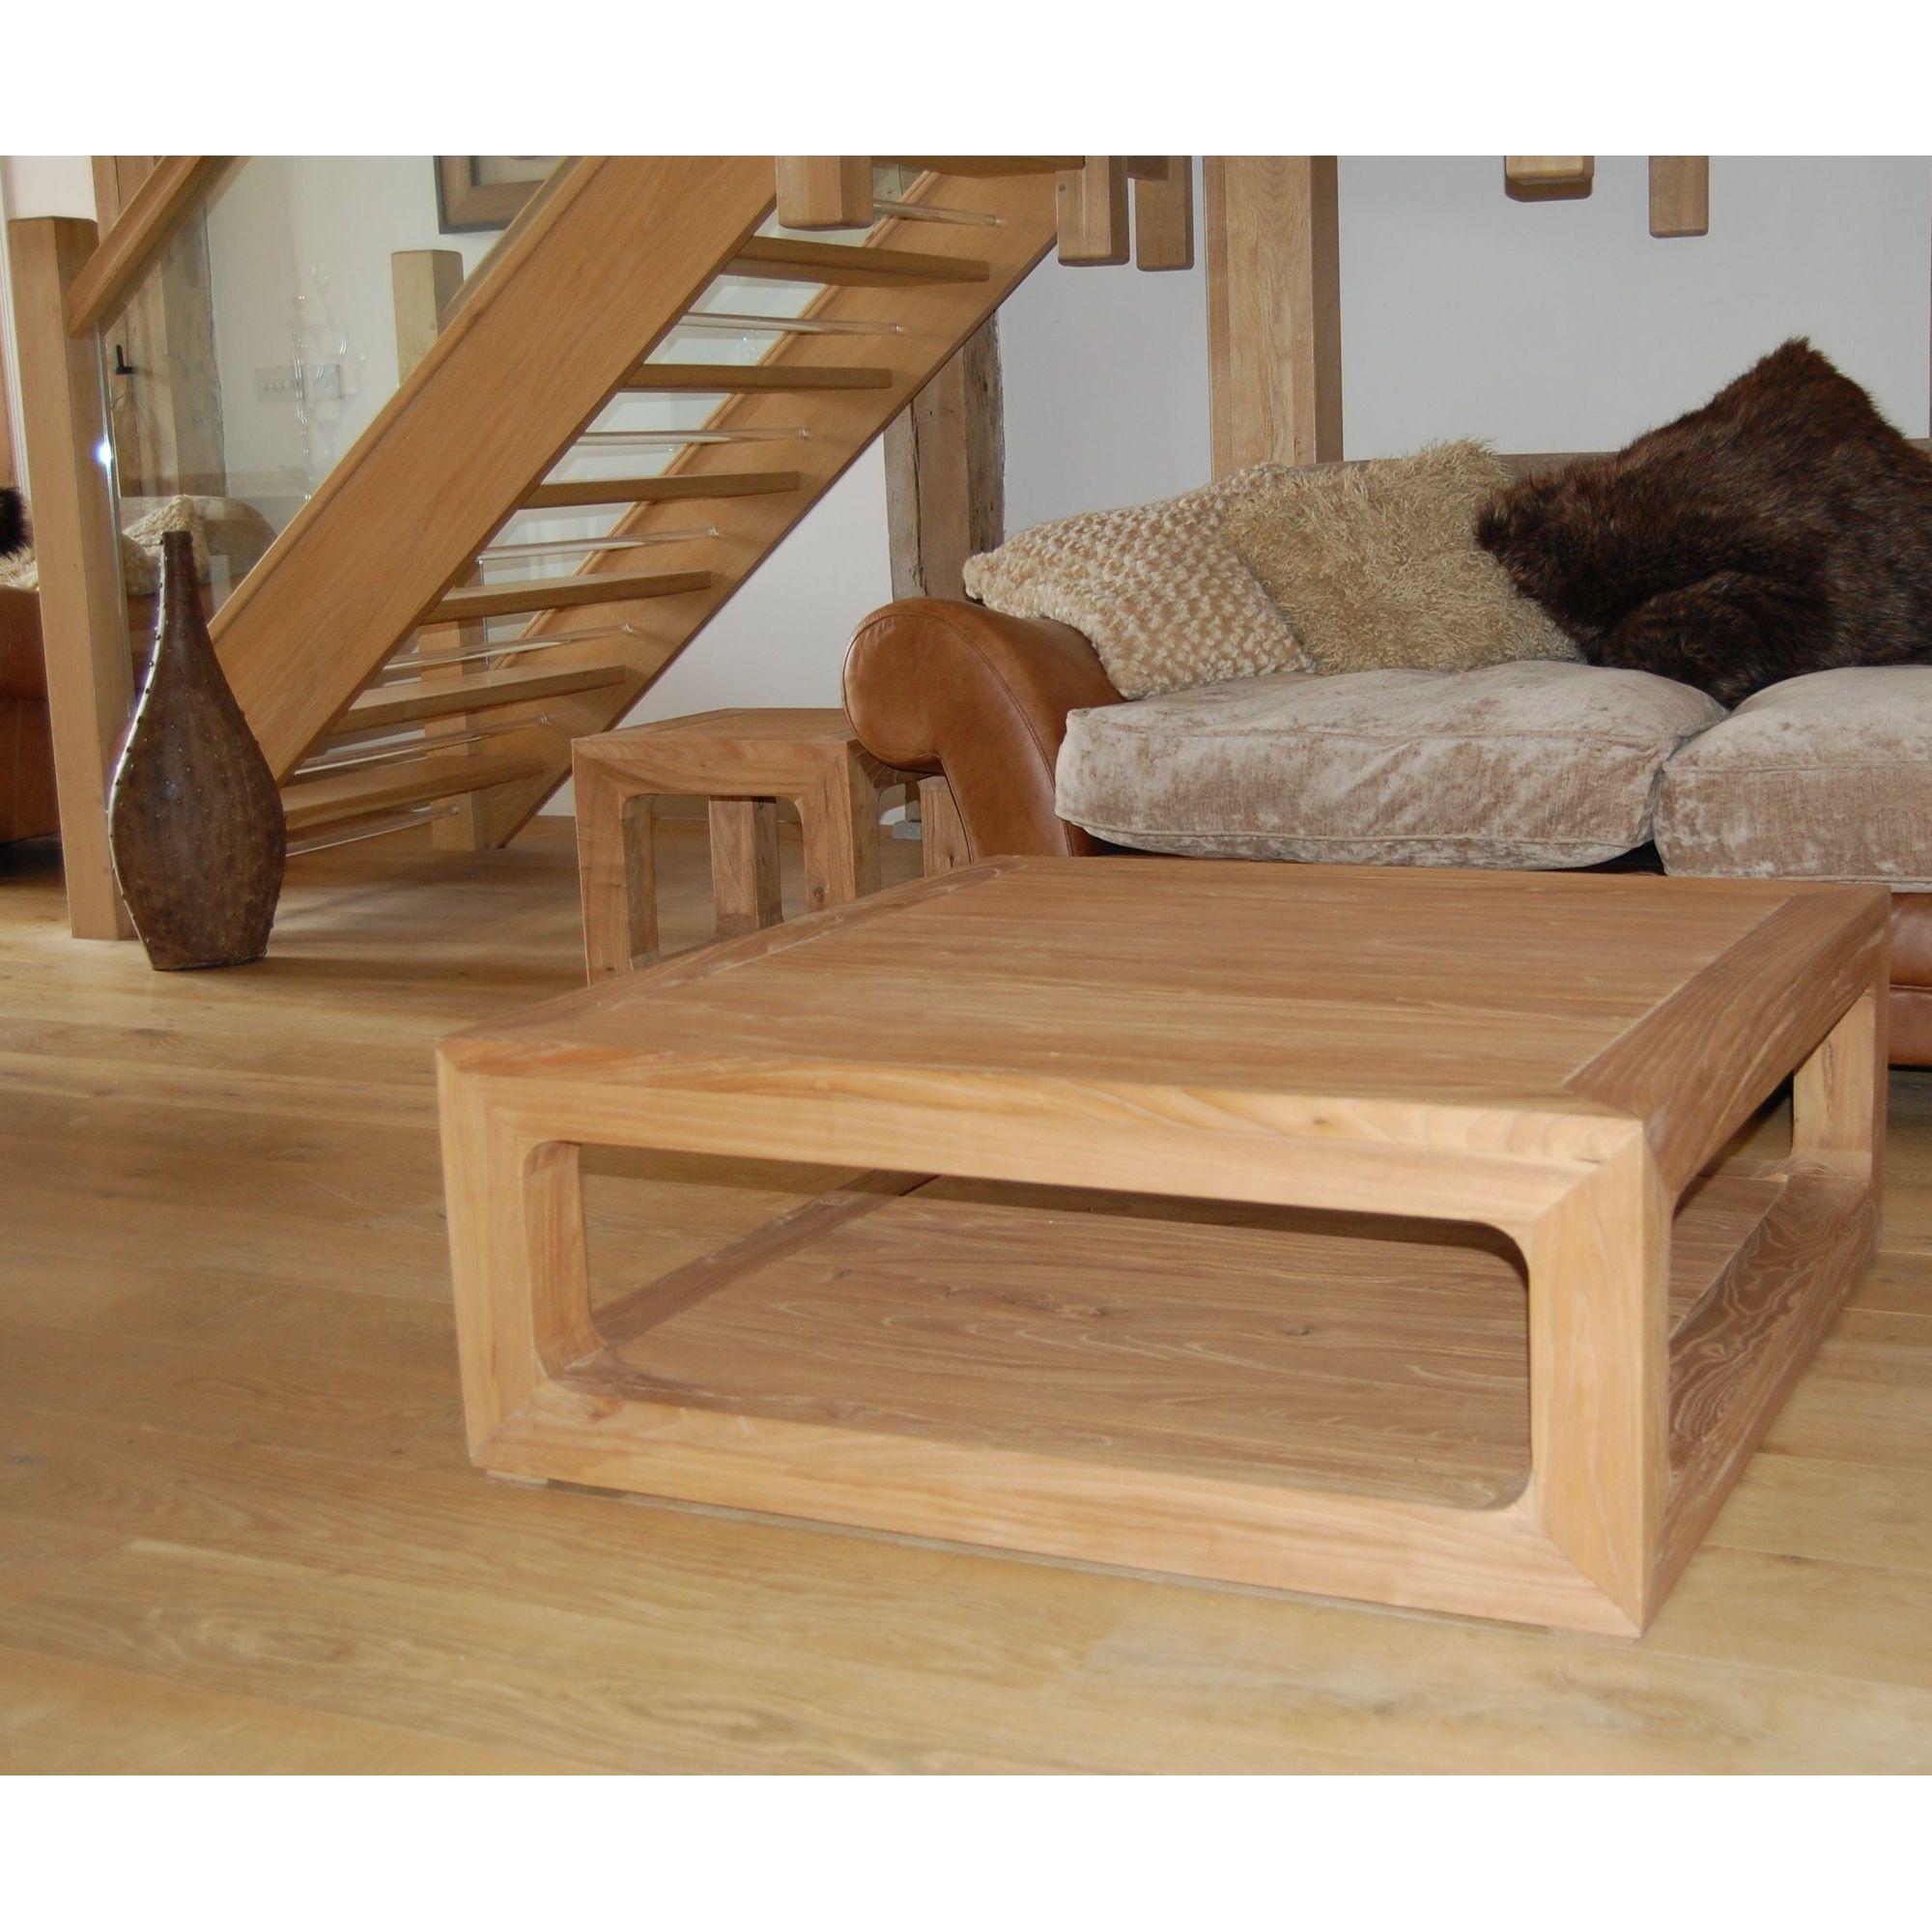 Katigi Designs Reclaimed Wooden Coffee Table at Tesco Direct